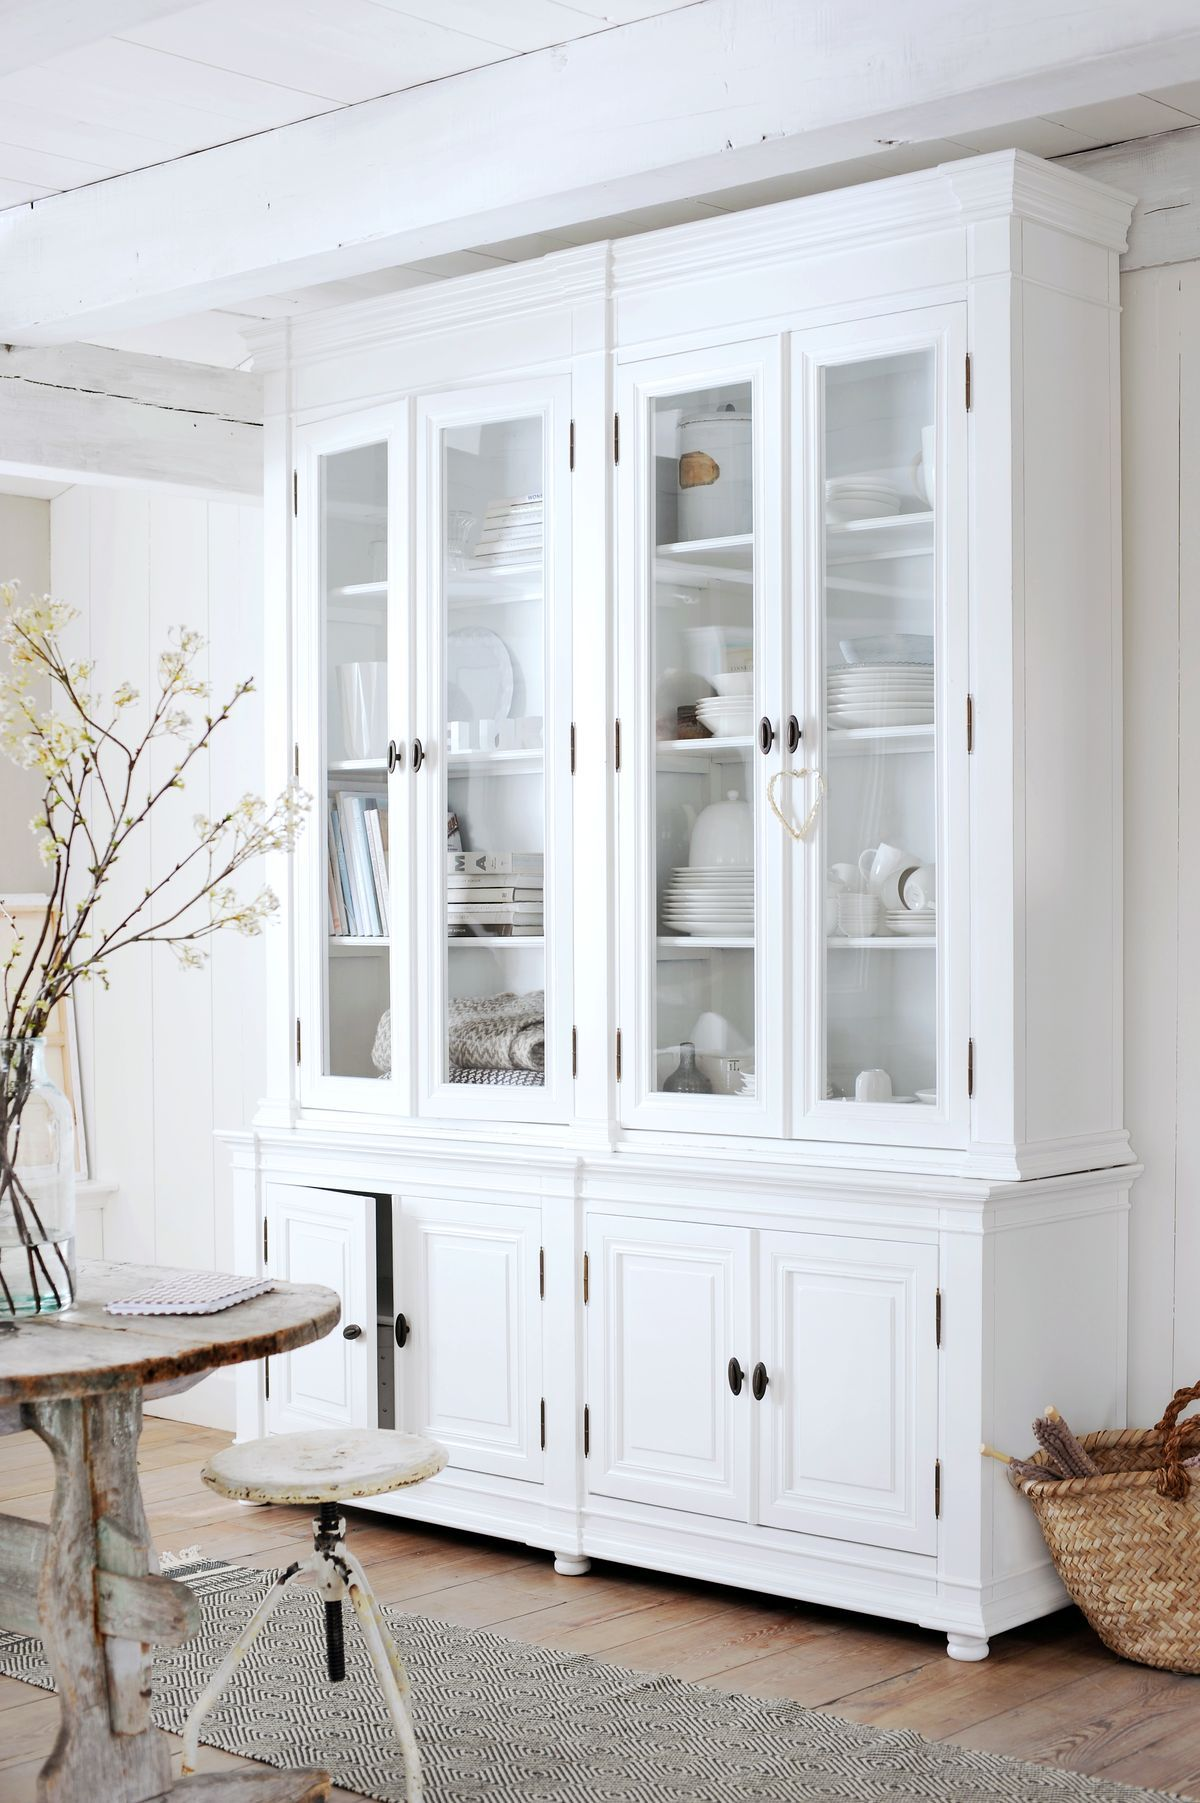 White Kitchen Set With Hutch